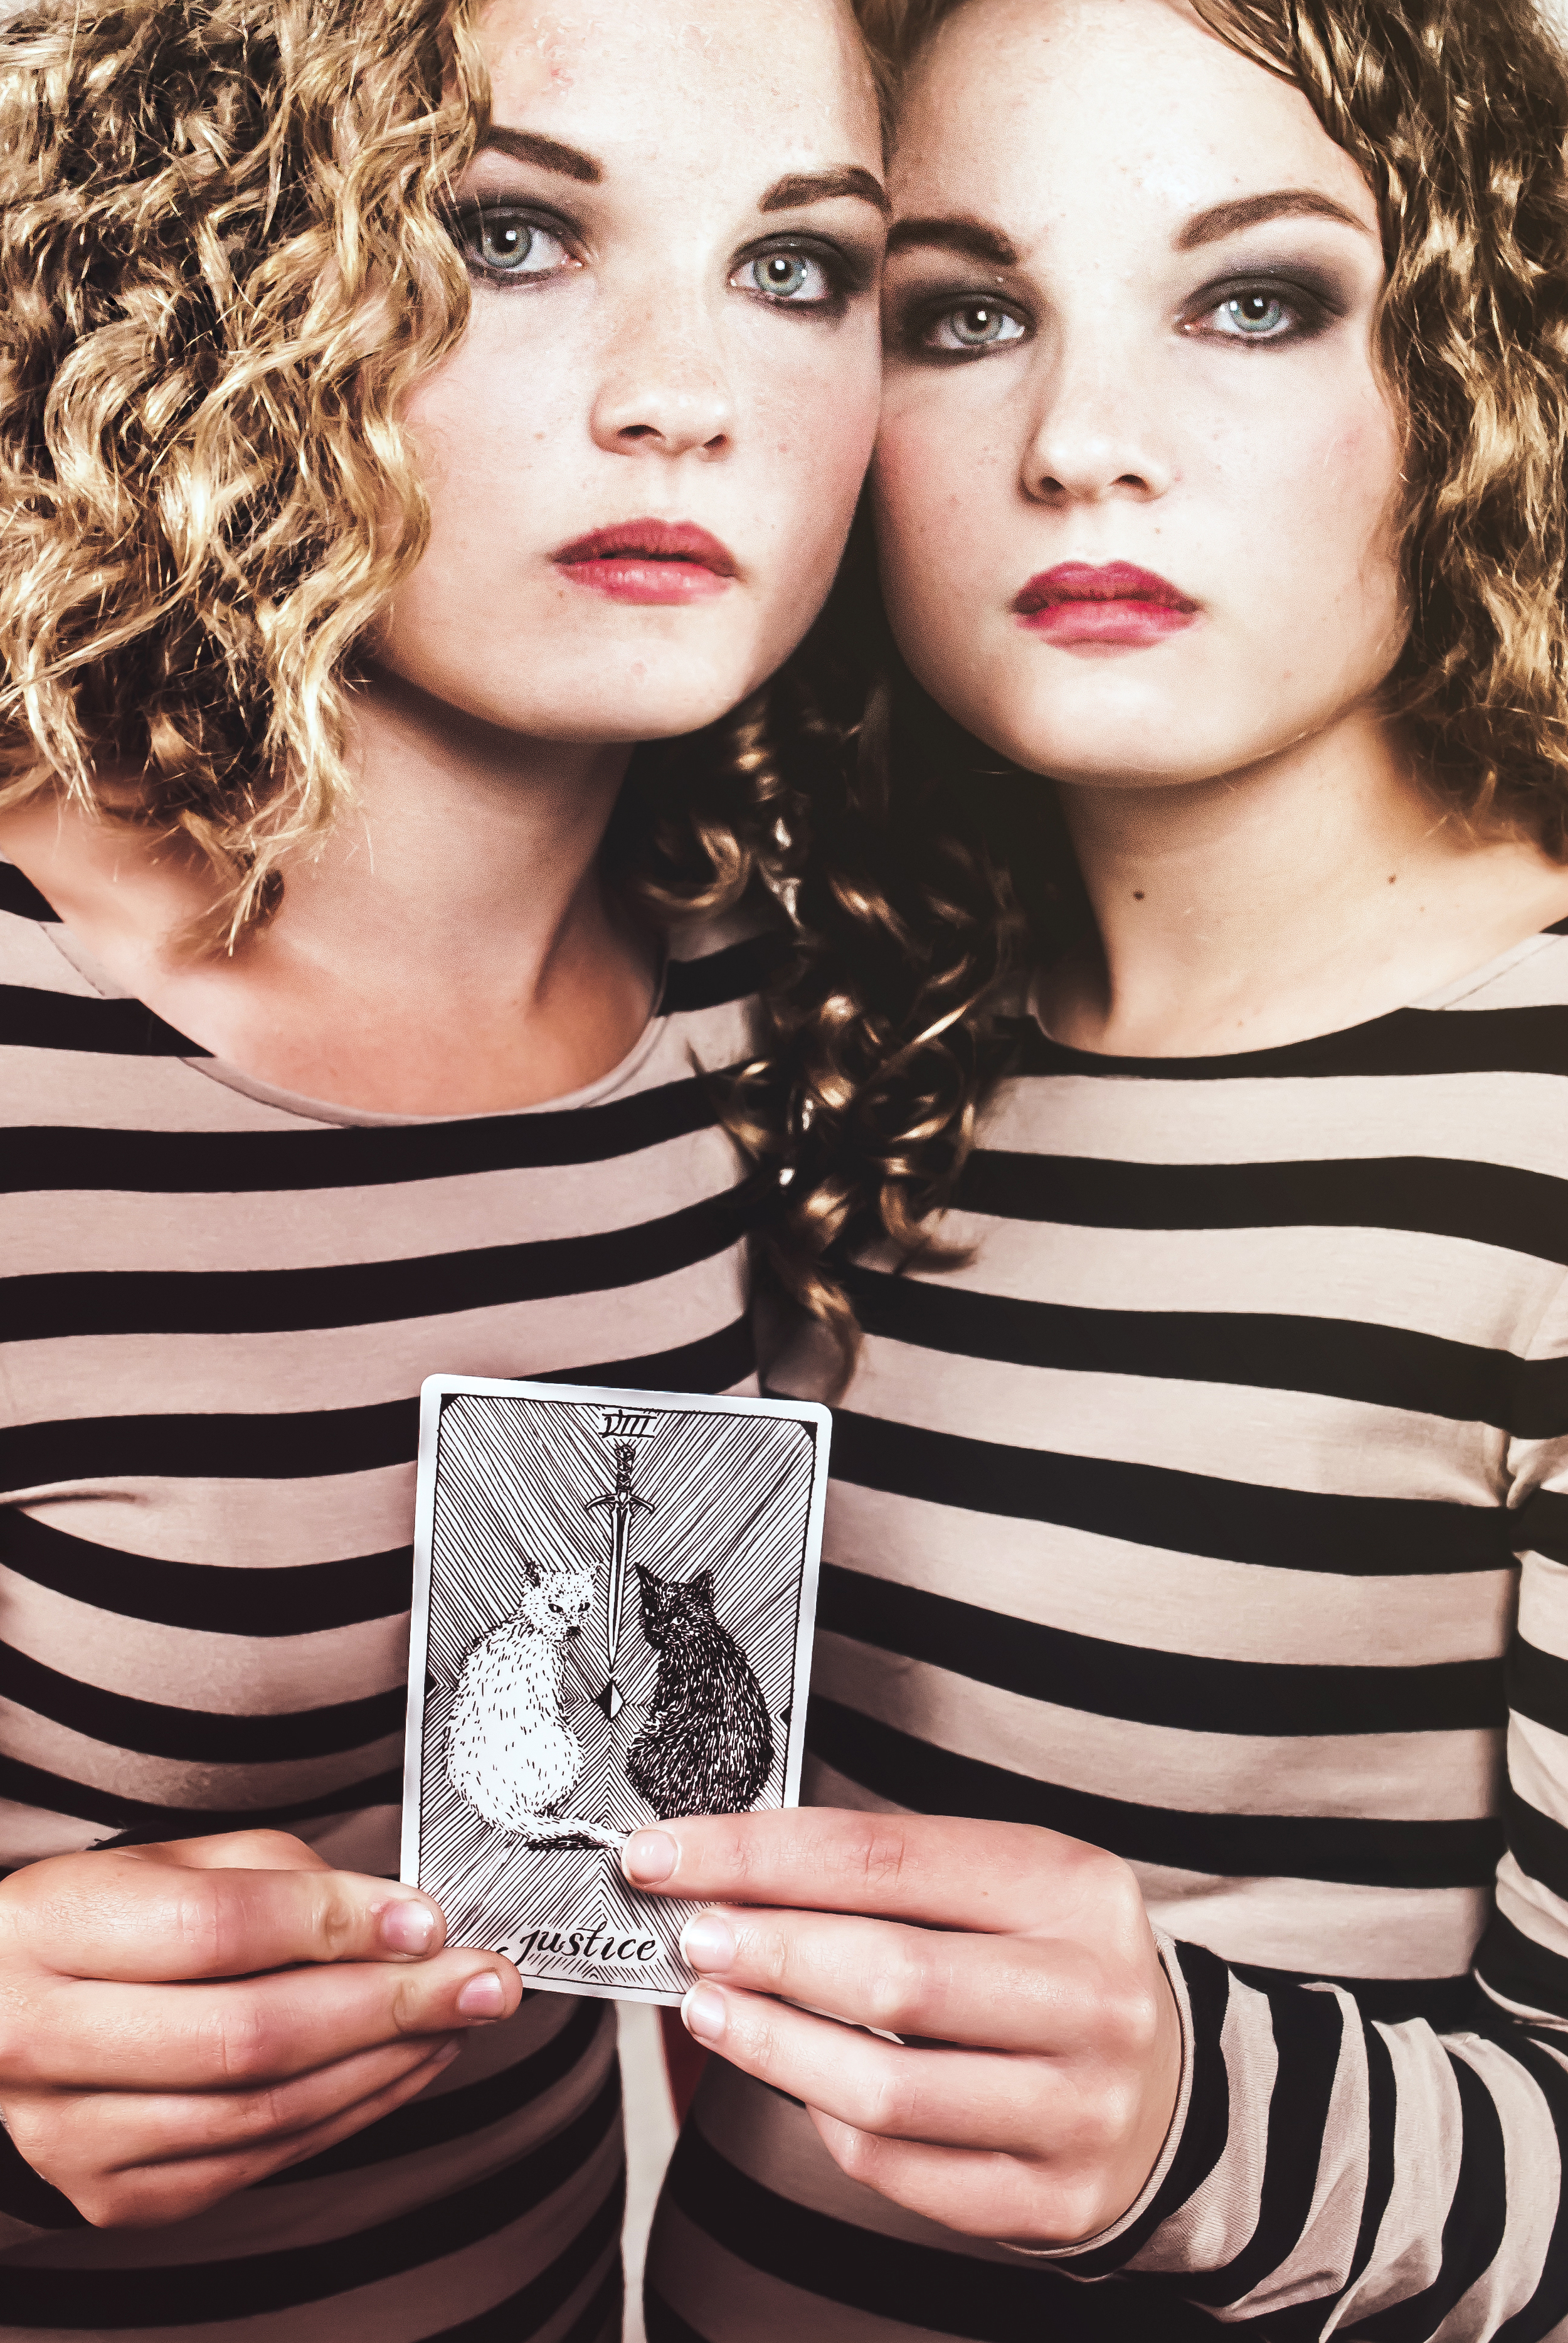 Molly&Tess02.jpg